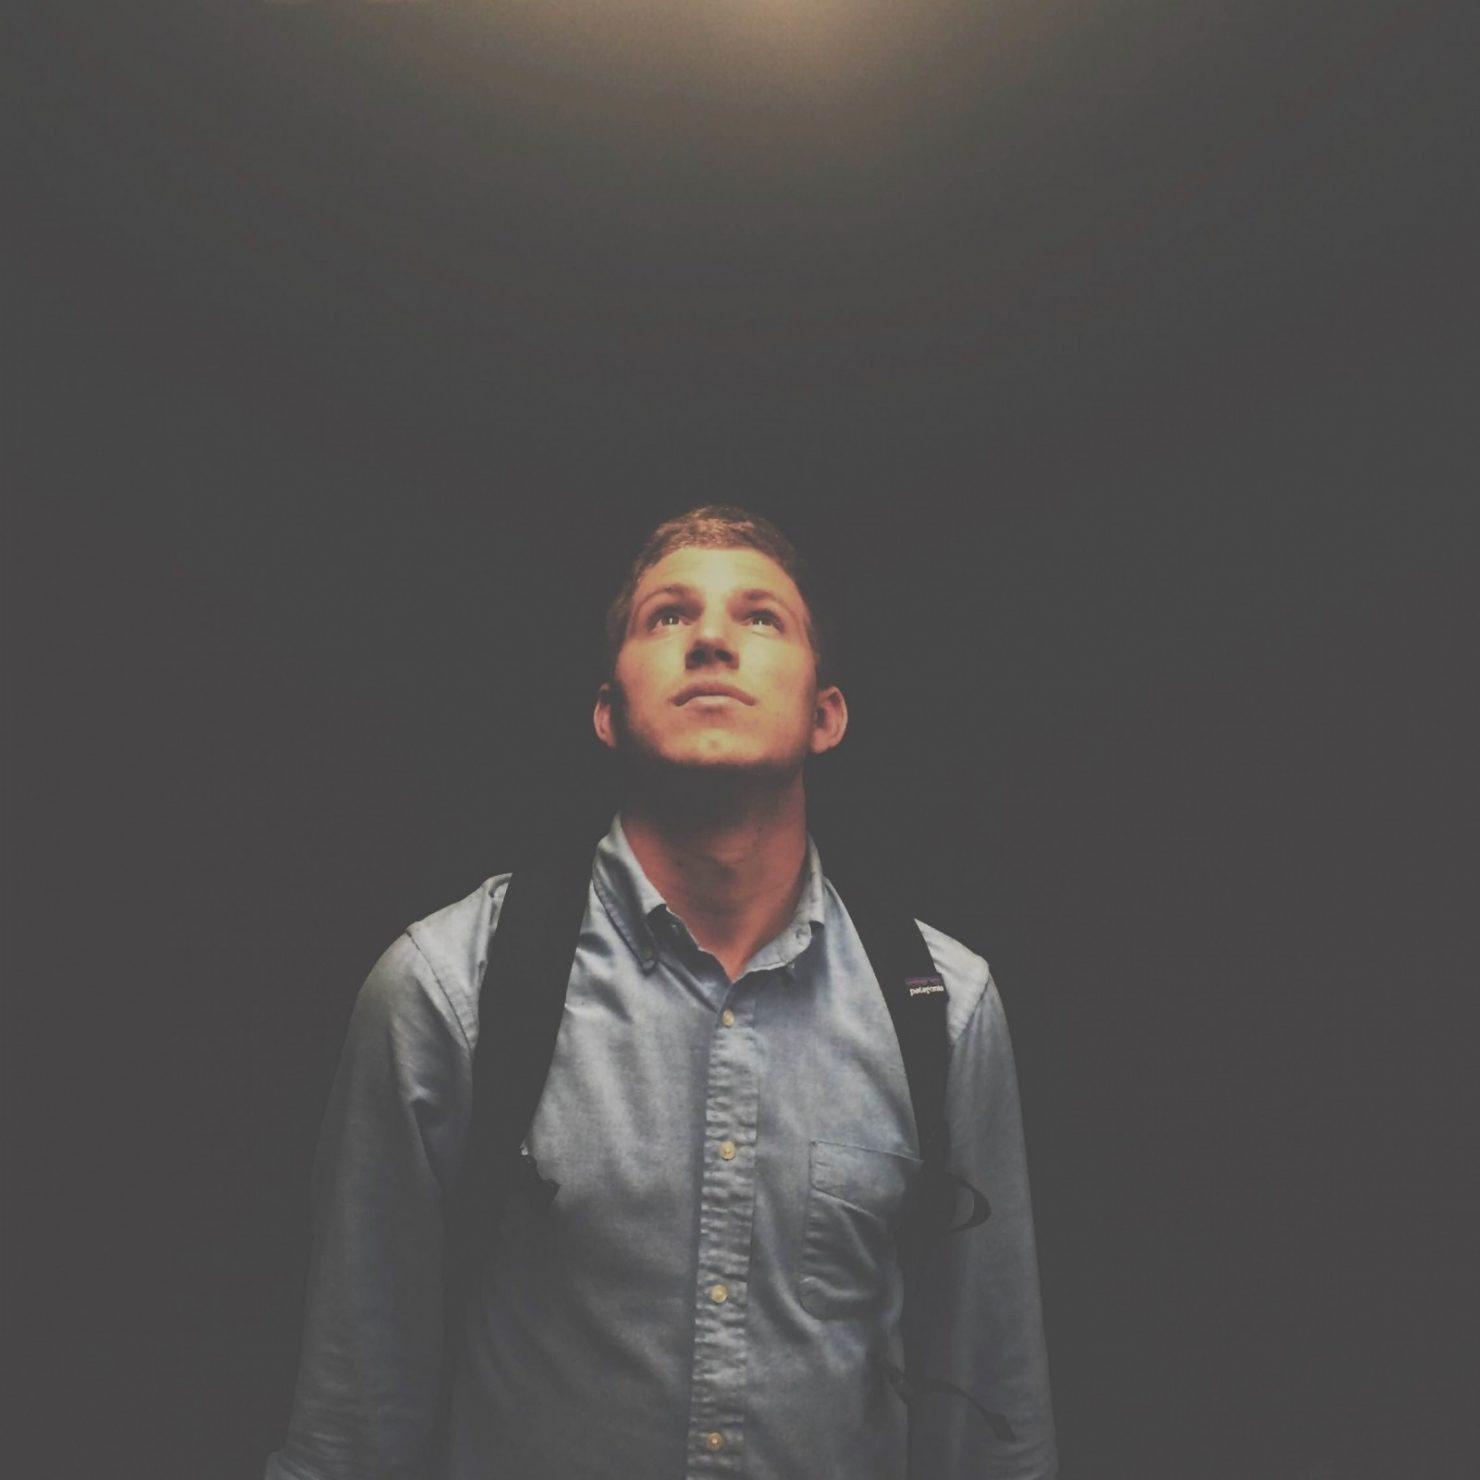 light-man-hope-looking-up